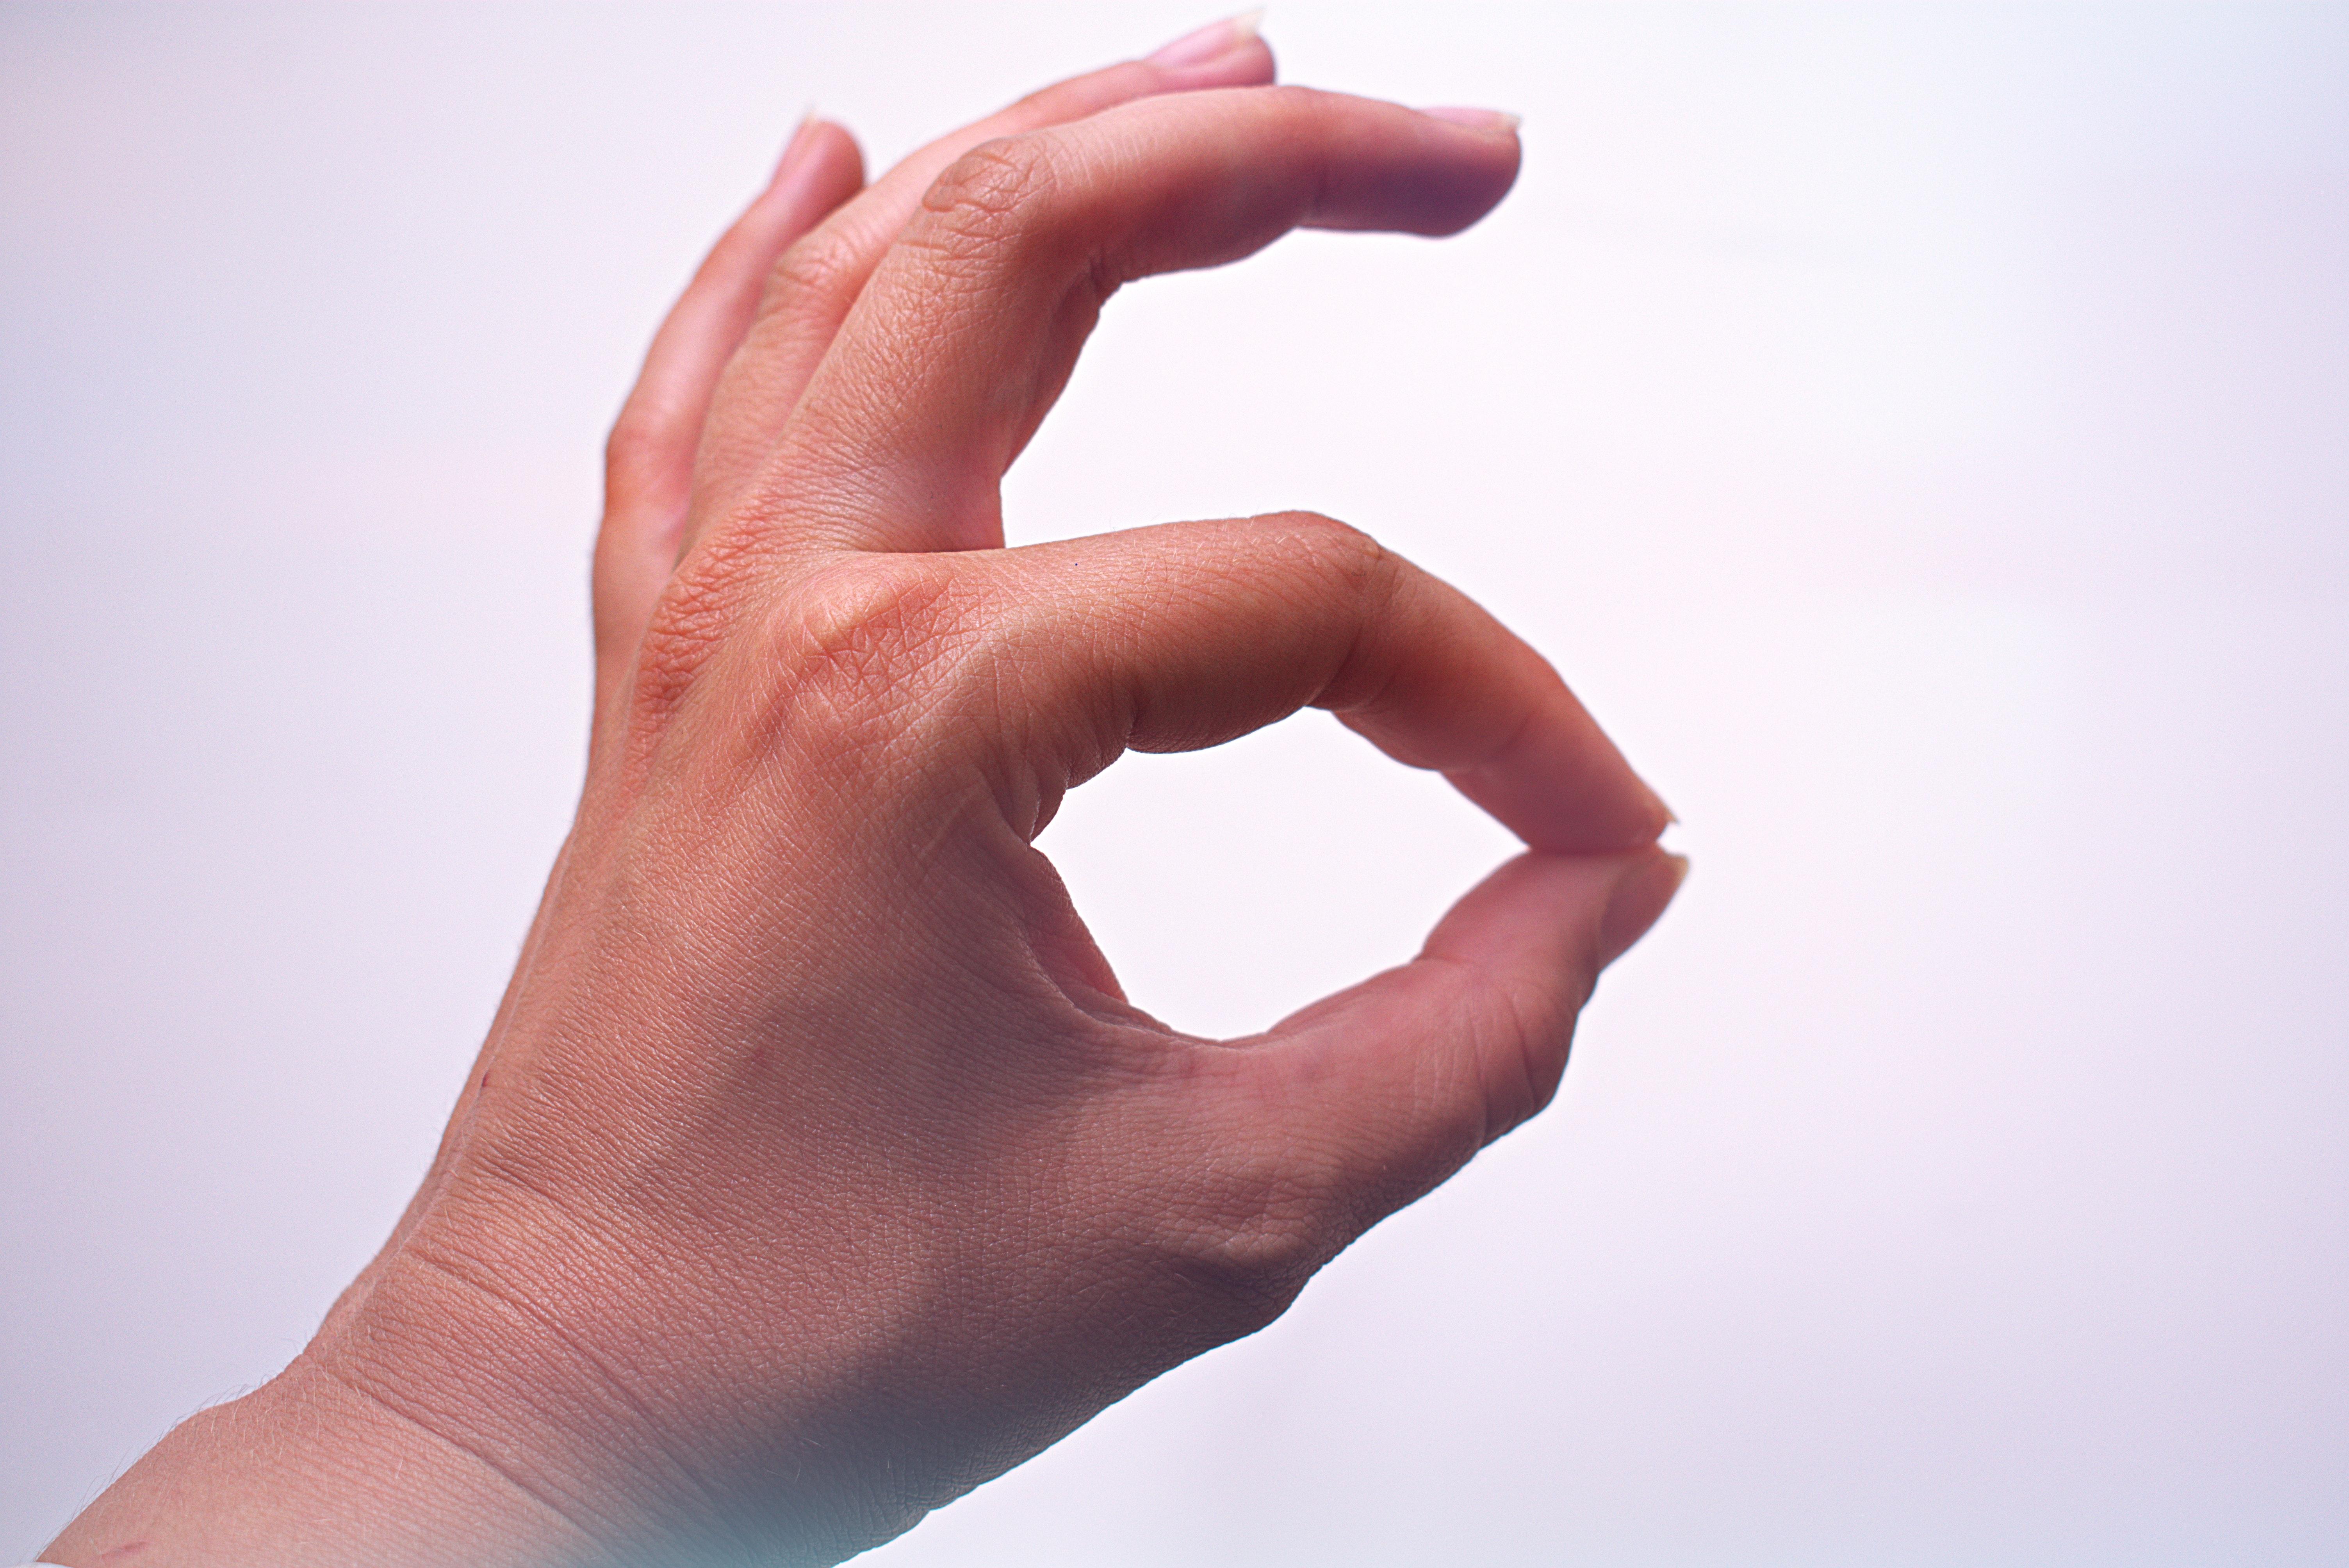 Картинка с пальцами, картинки документ